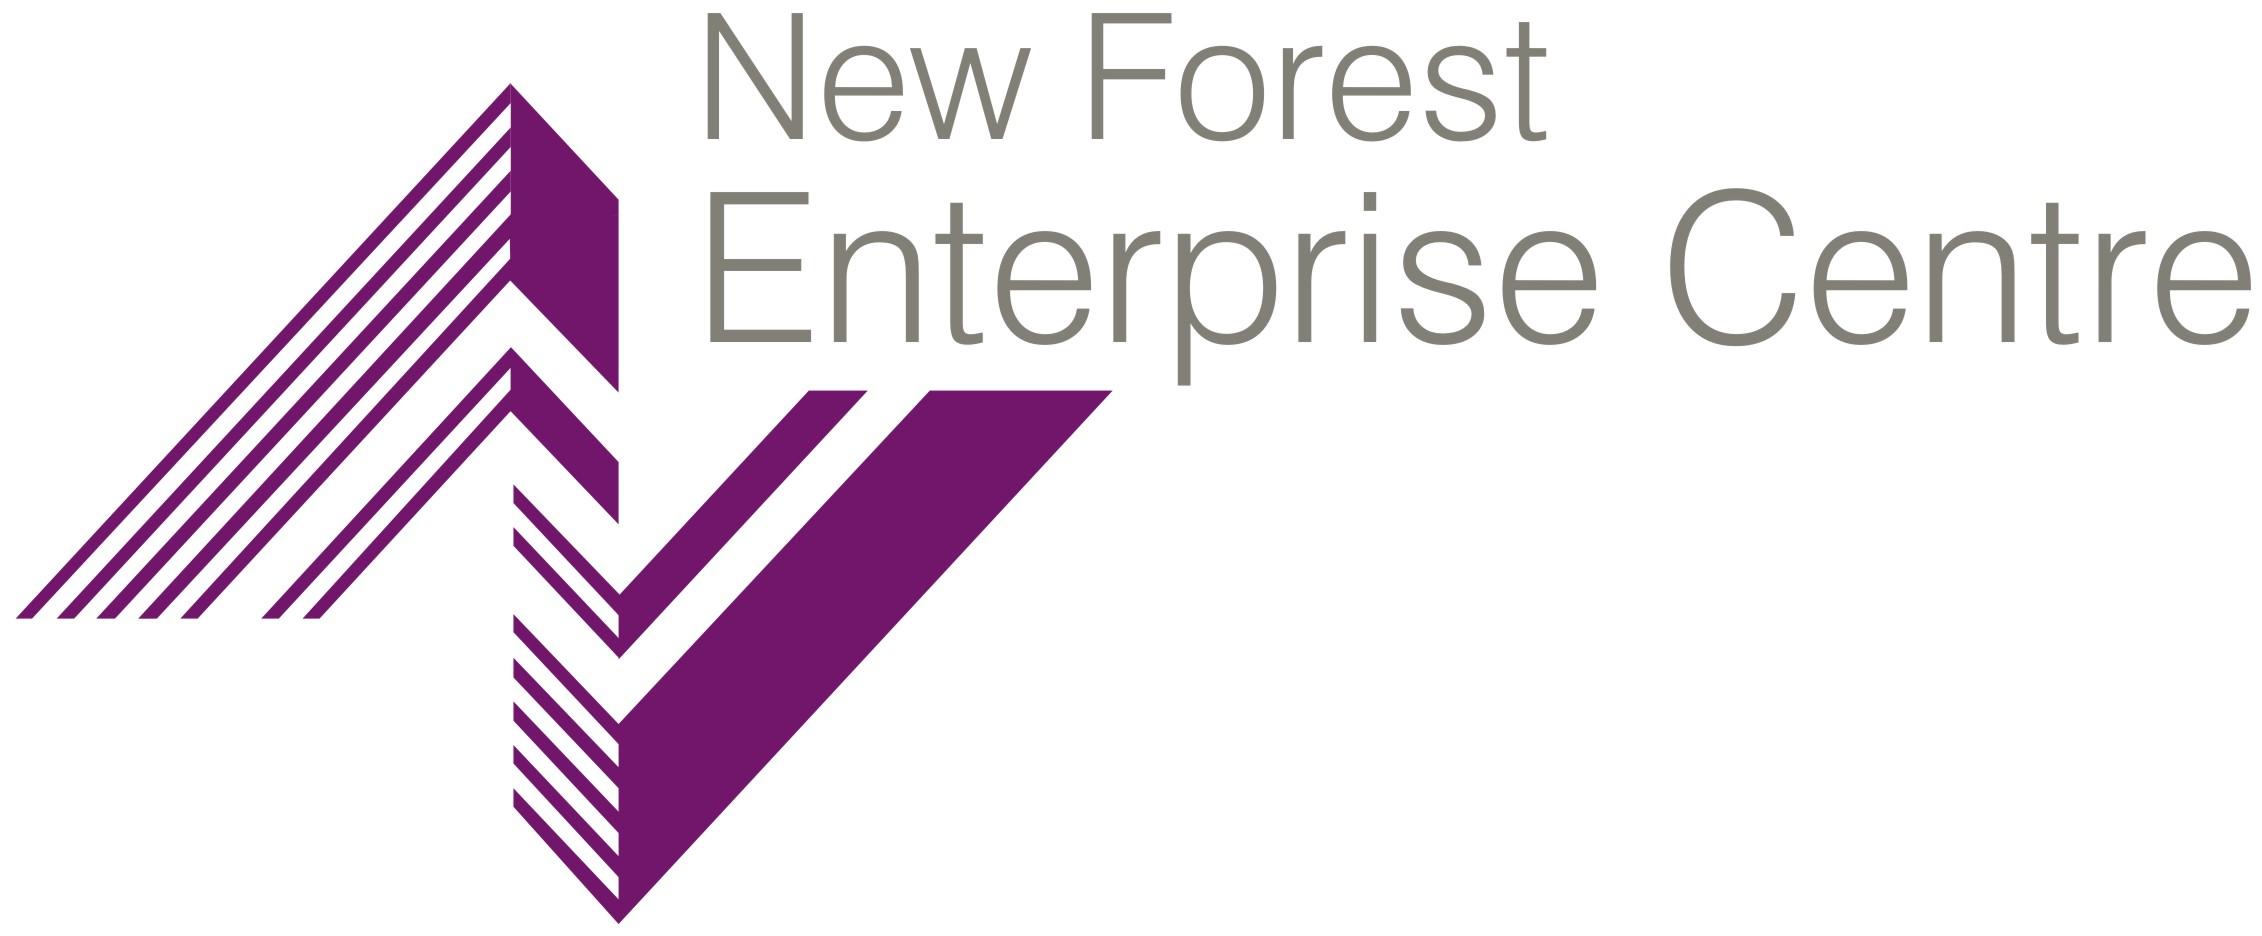 new forest enterprise centre logo